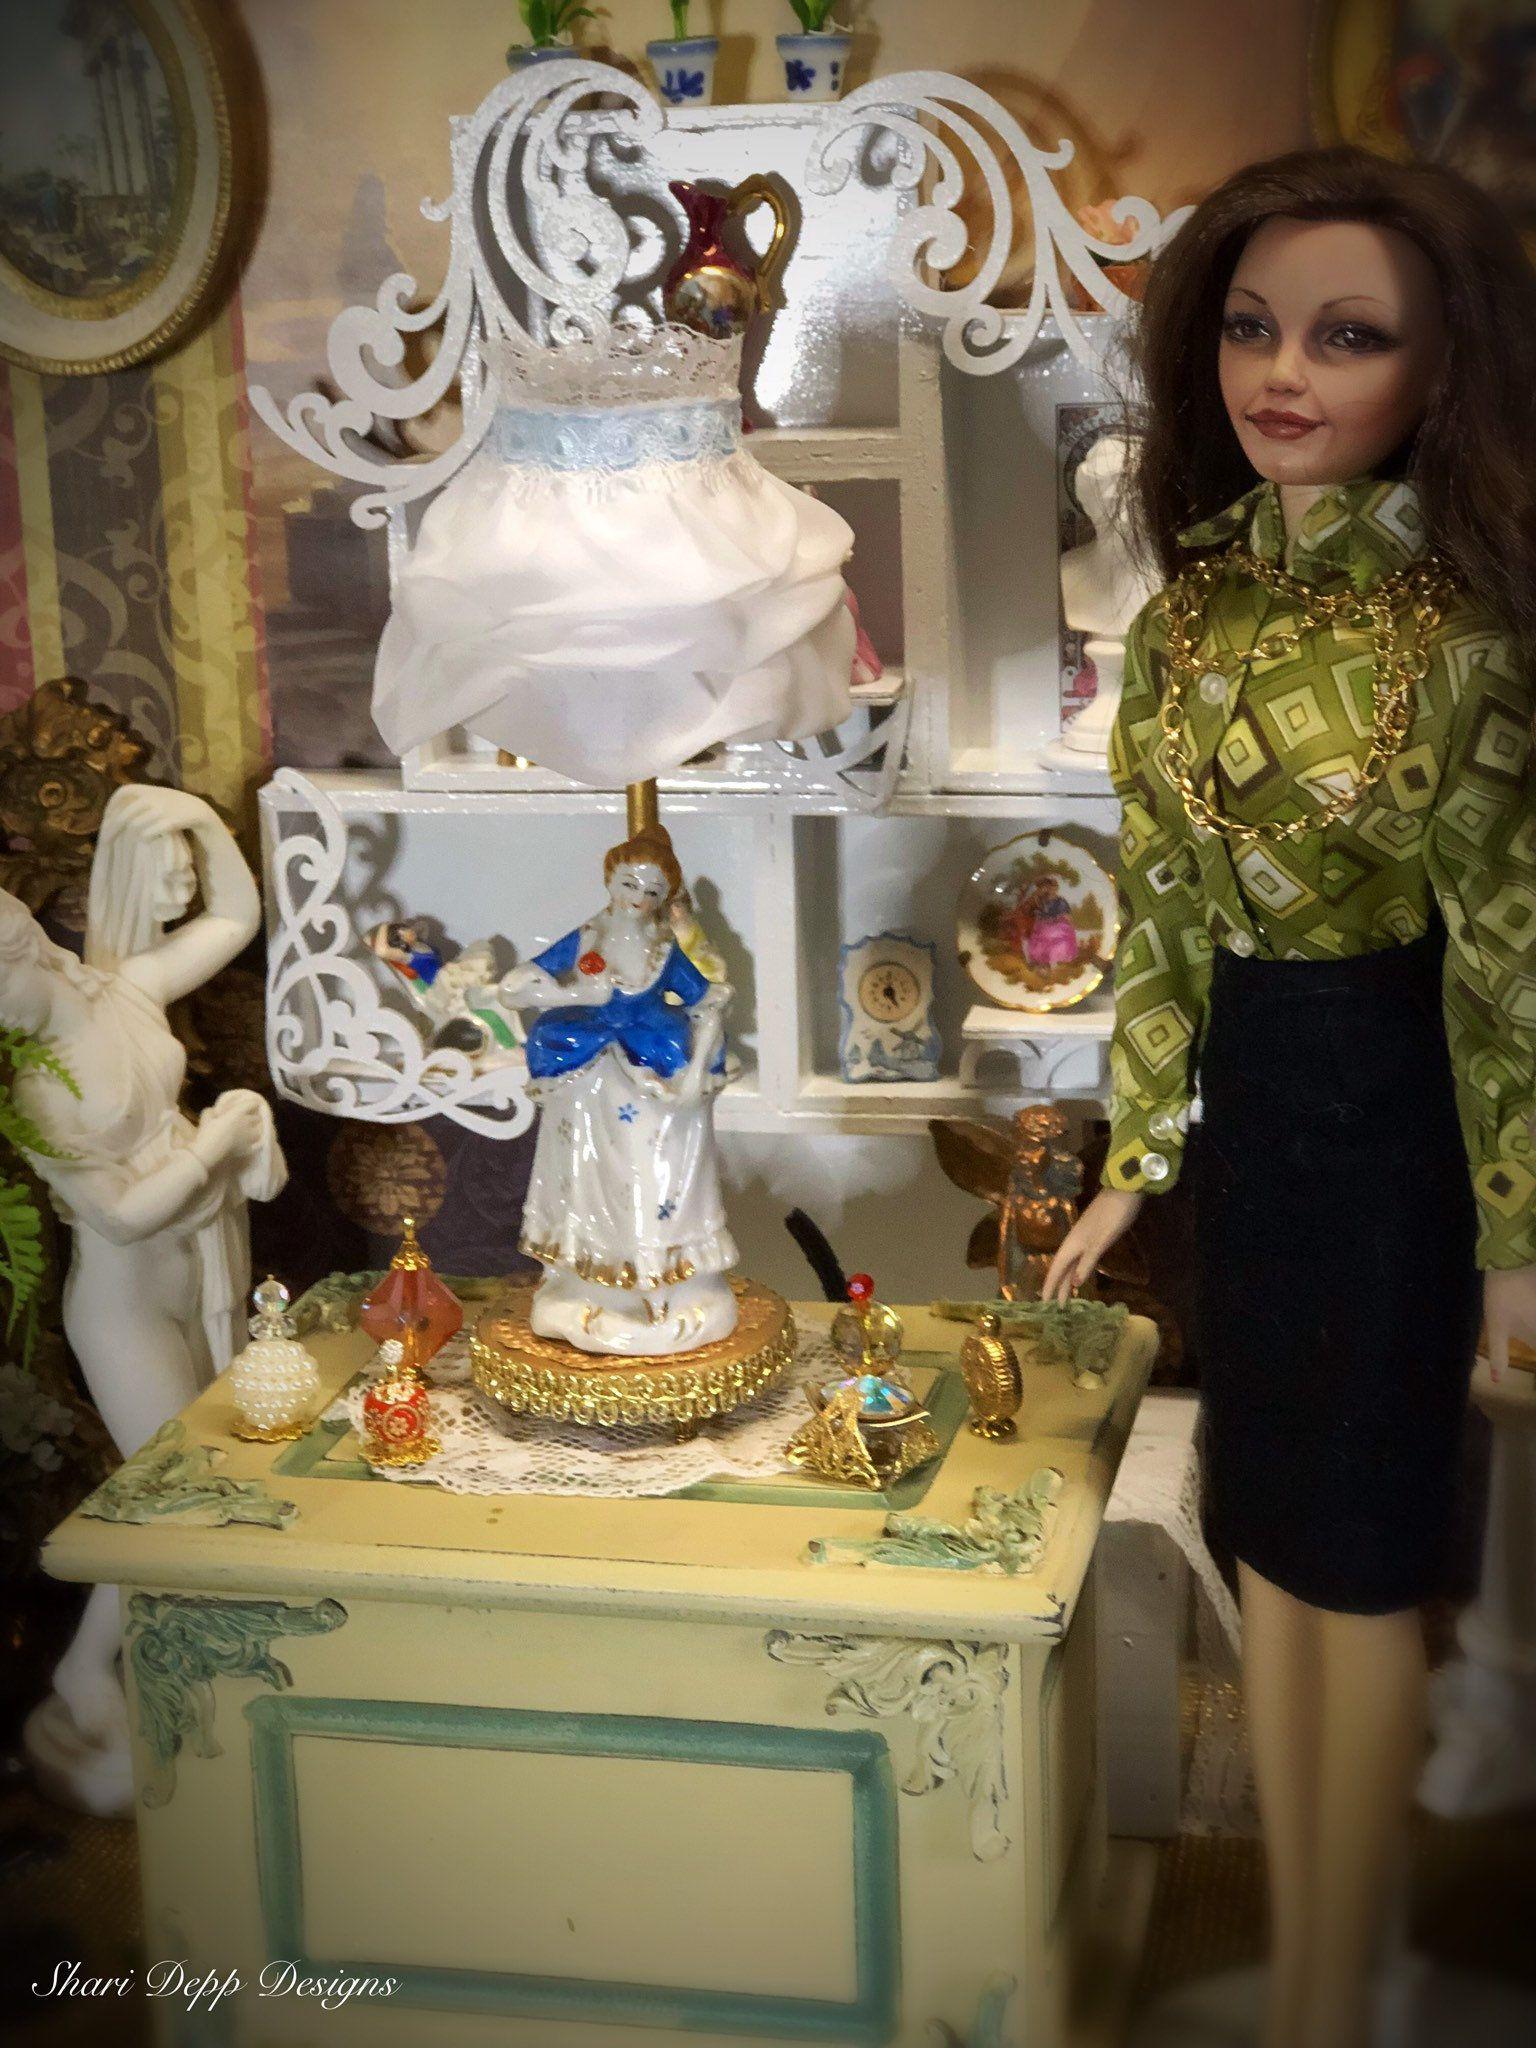 1:12 Retro Oil Lamp Dollhouse Miniature Toy Doll Home Living Room Decor JKP